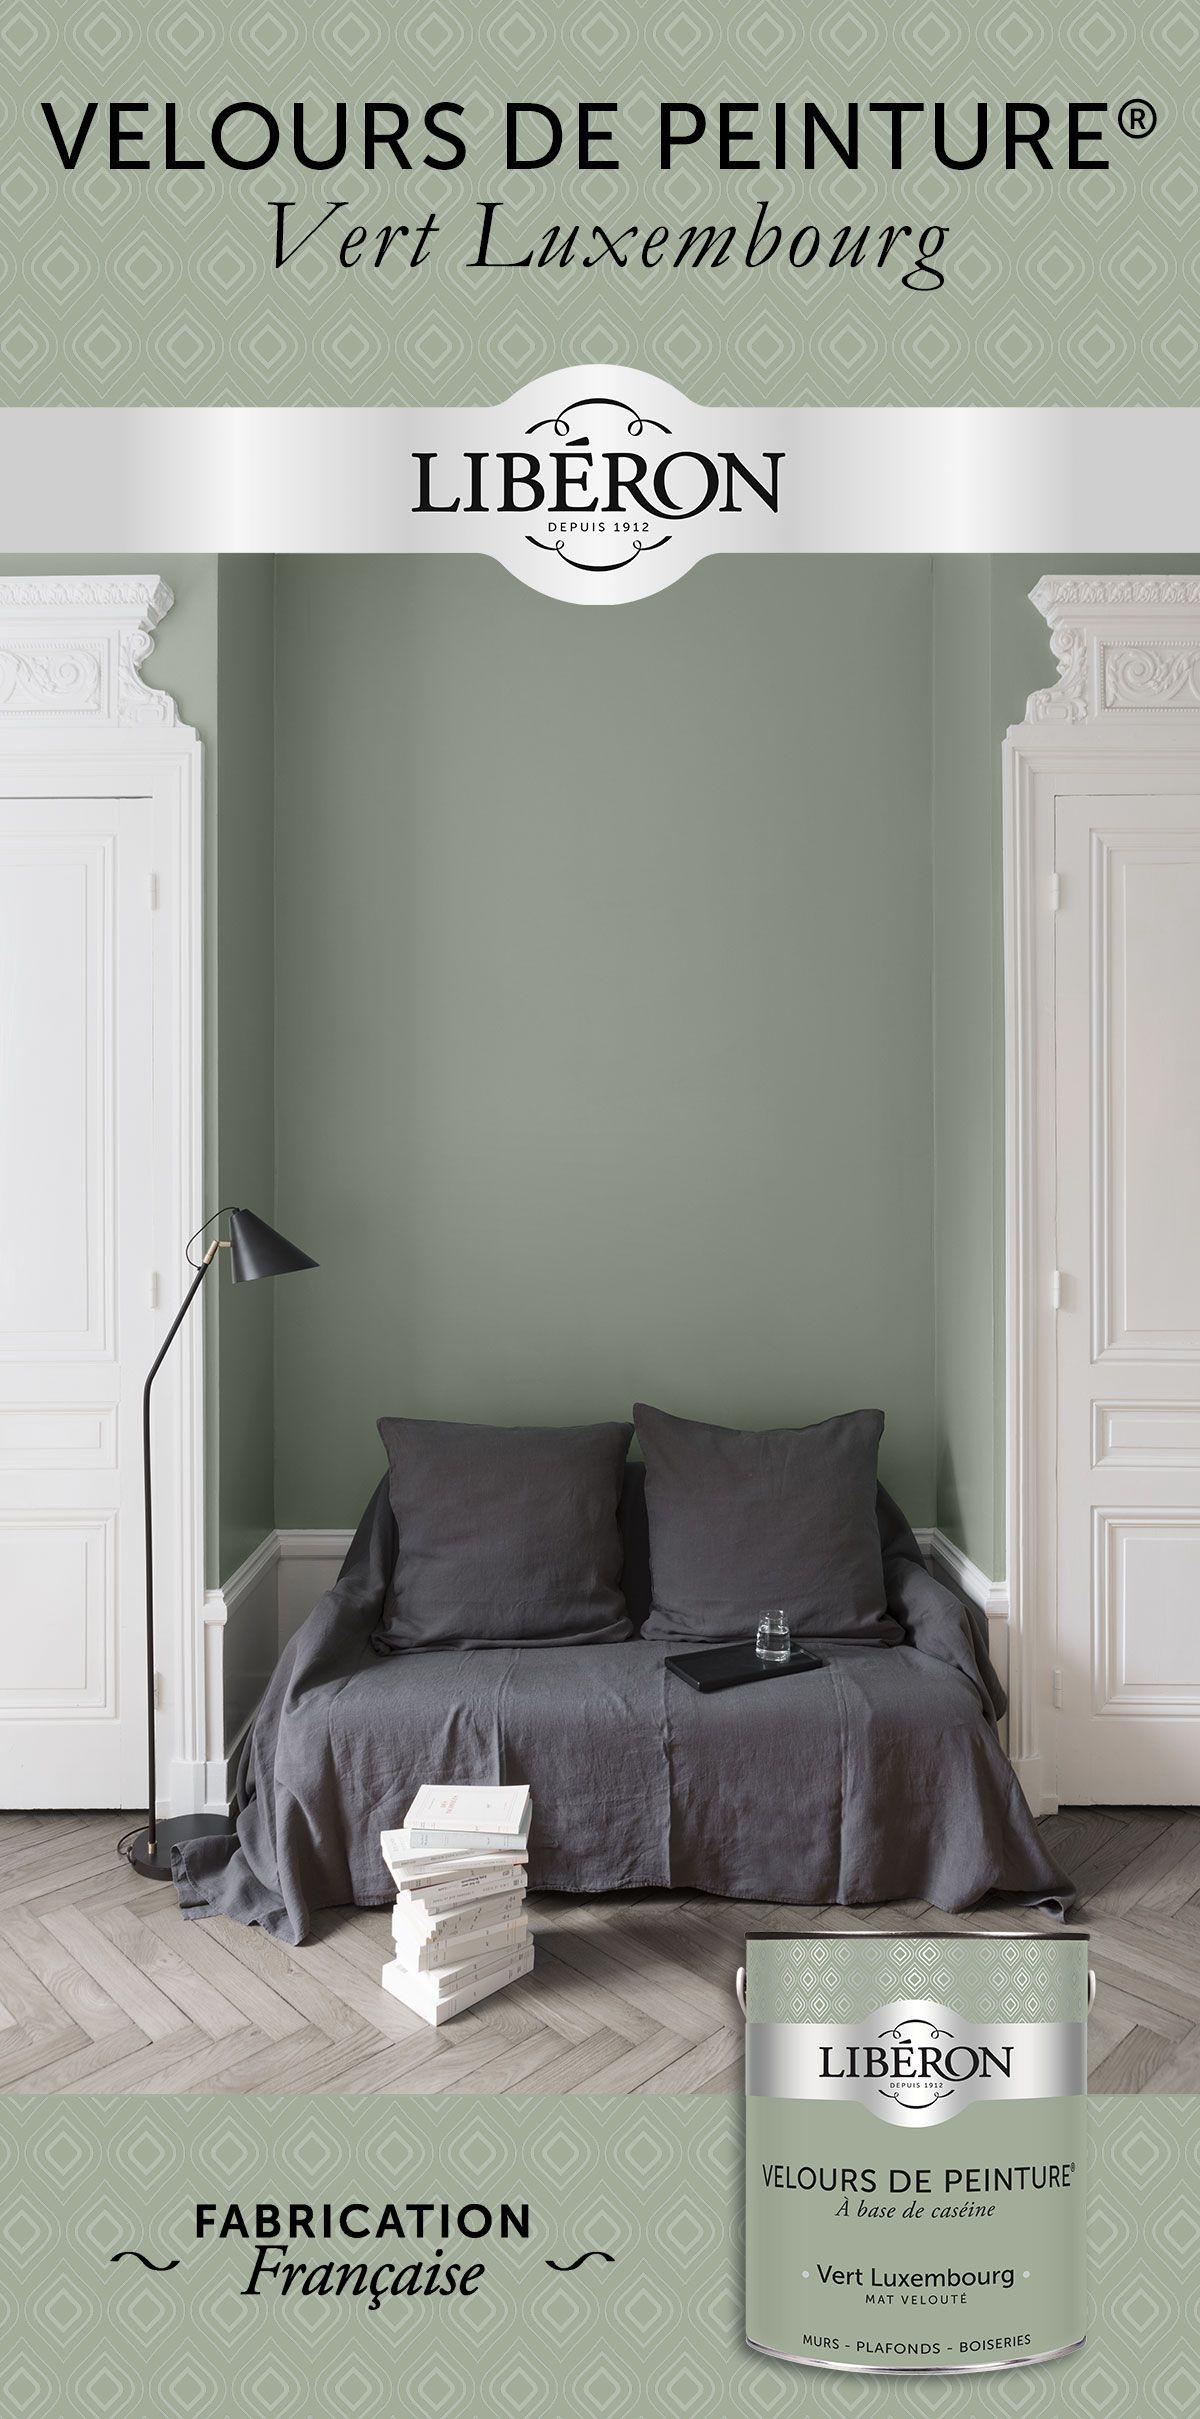 Vert Luxembourg - Peinture murs Velours de Peinture® Libéron